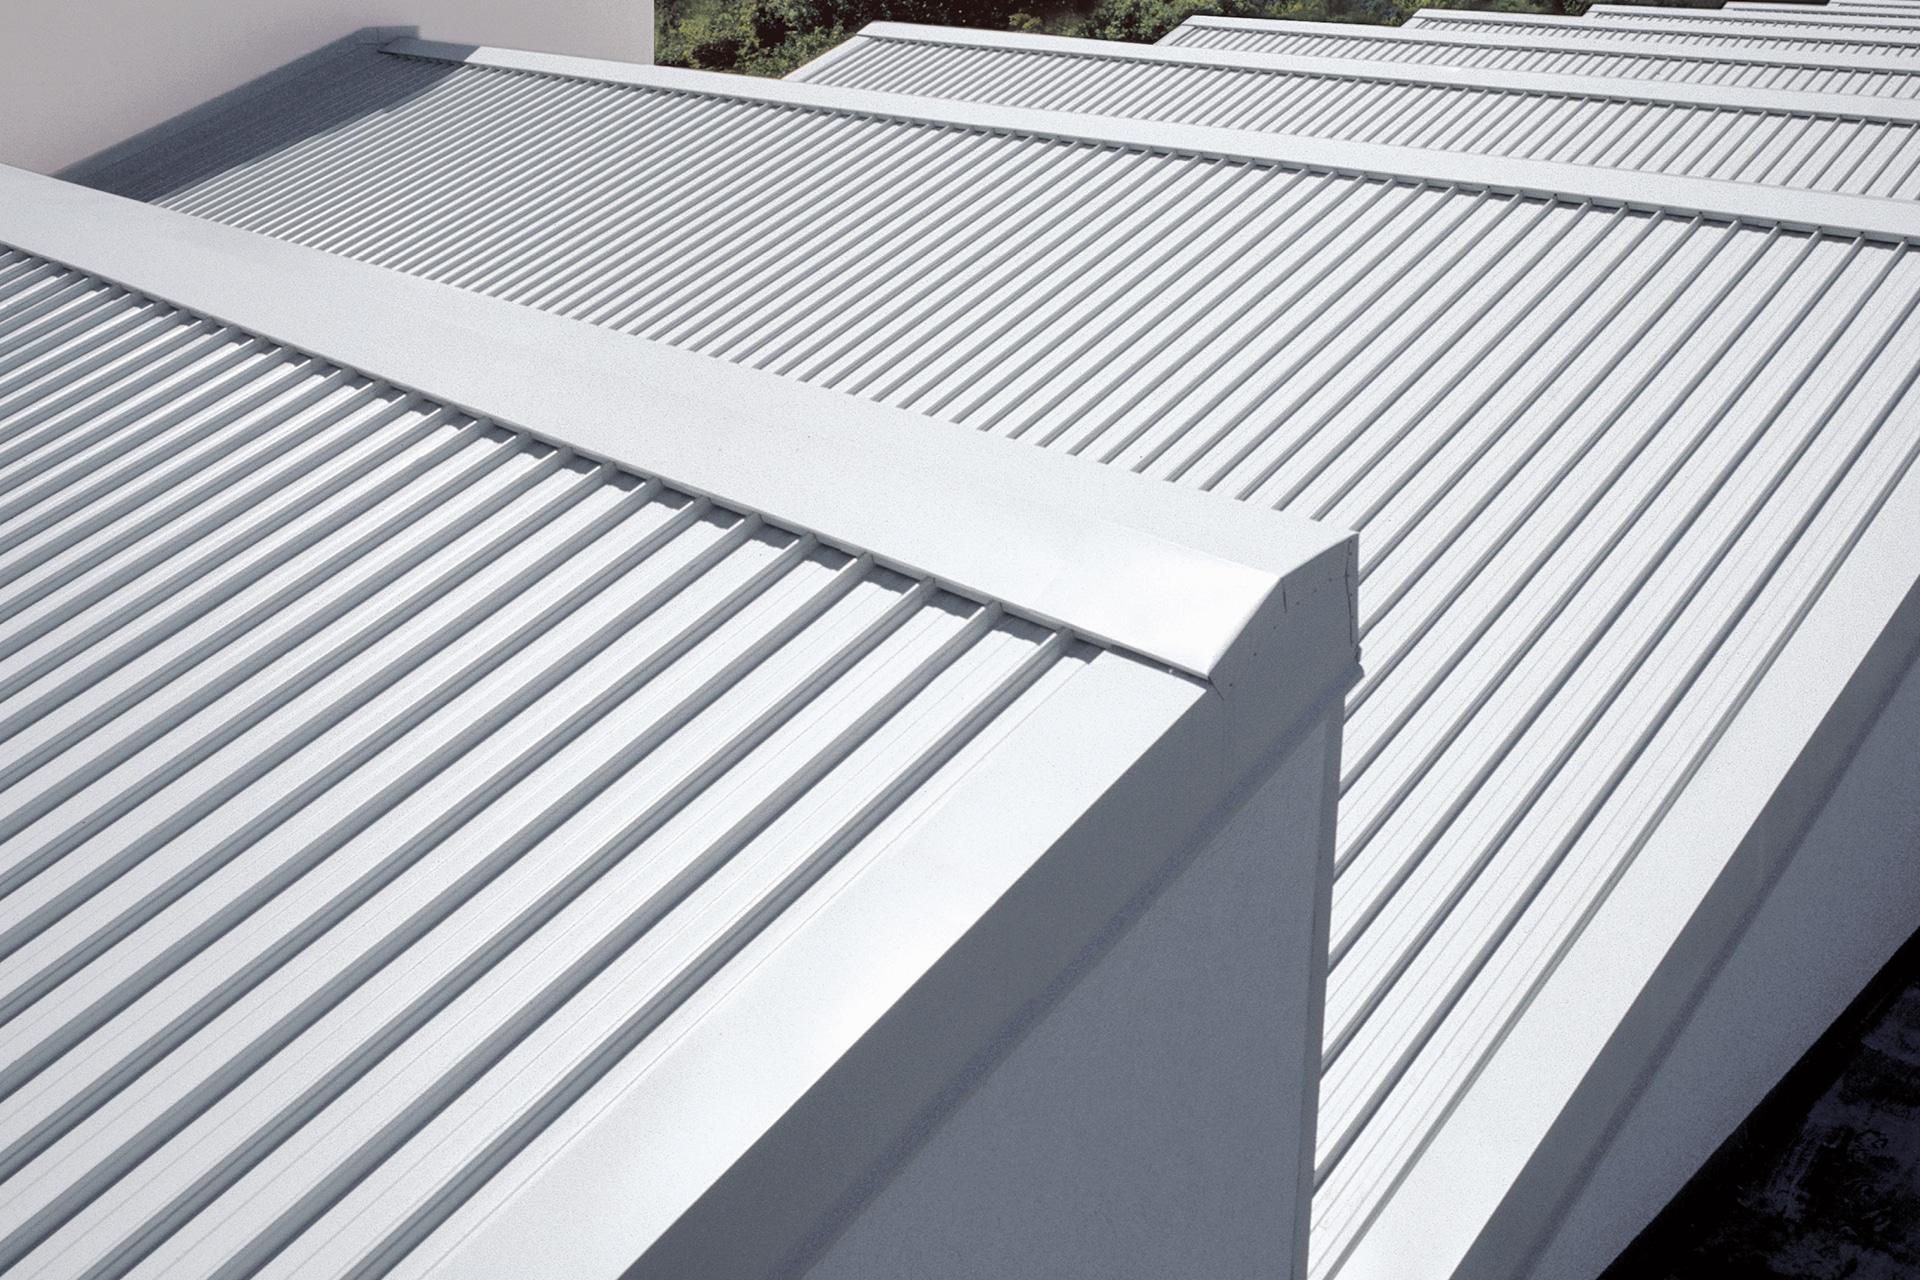 kehle dach